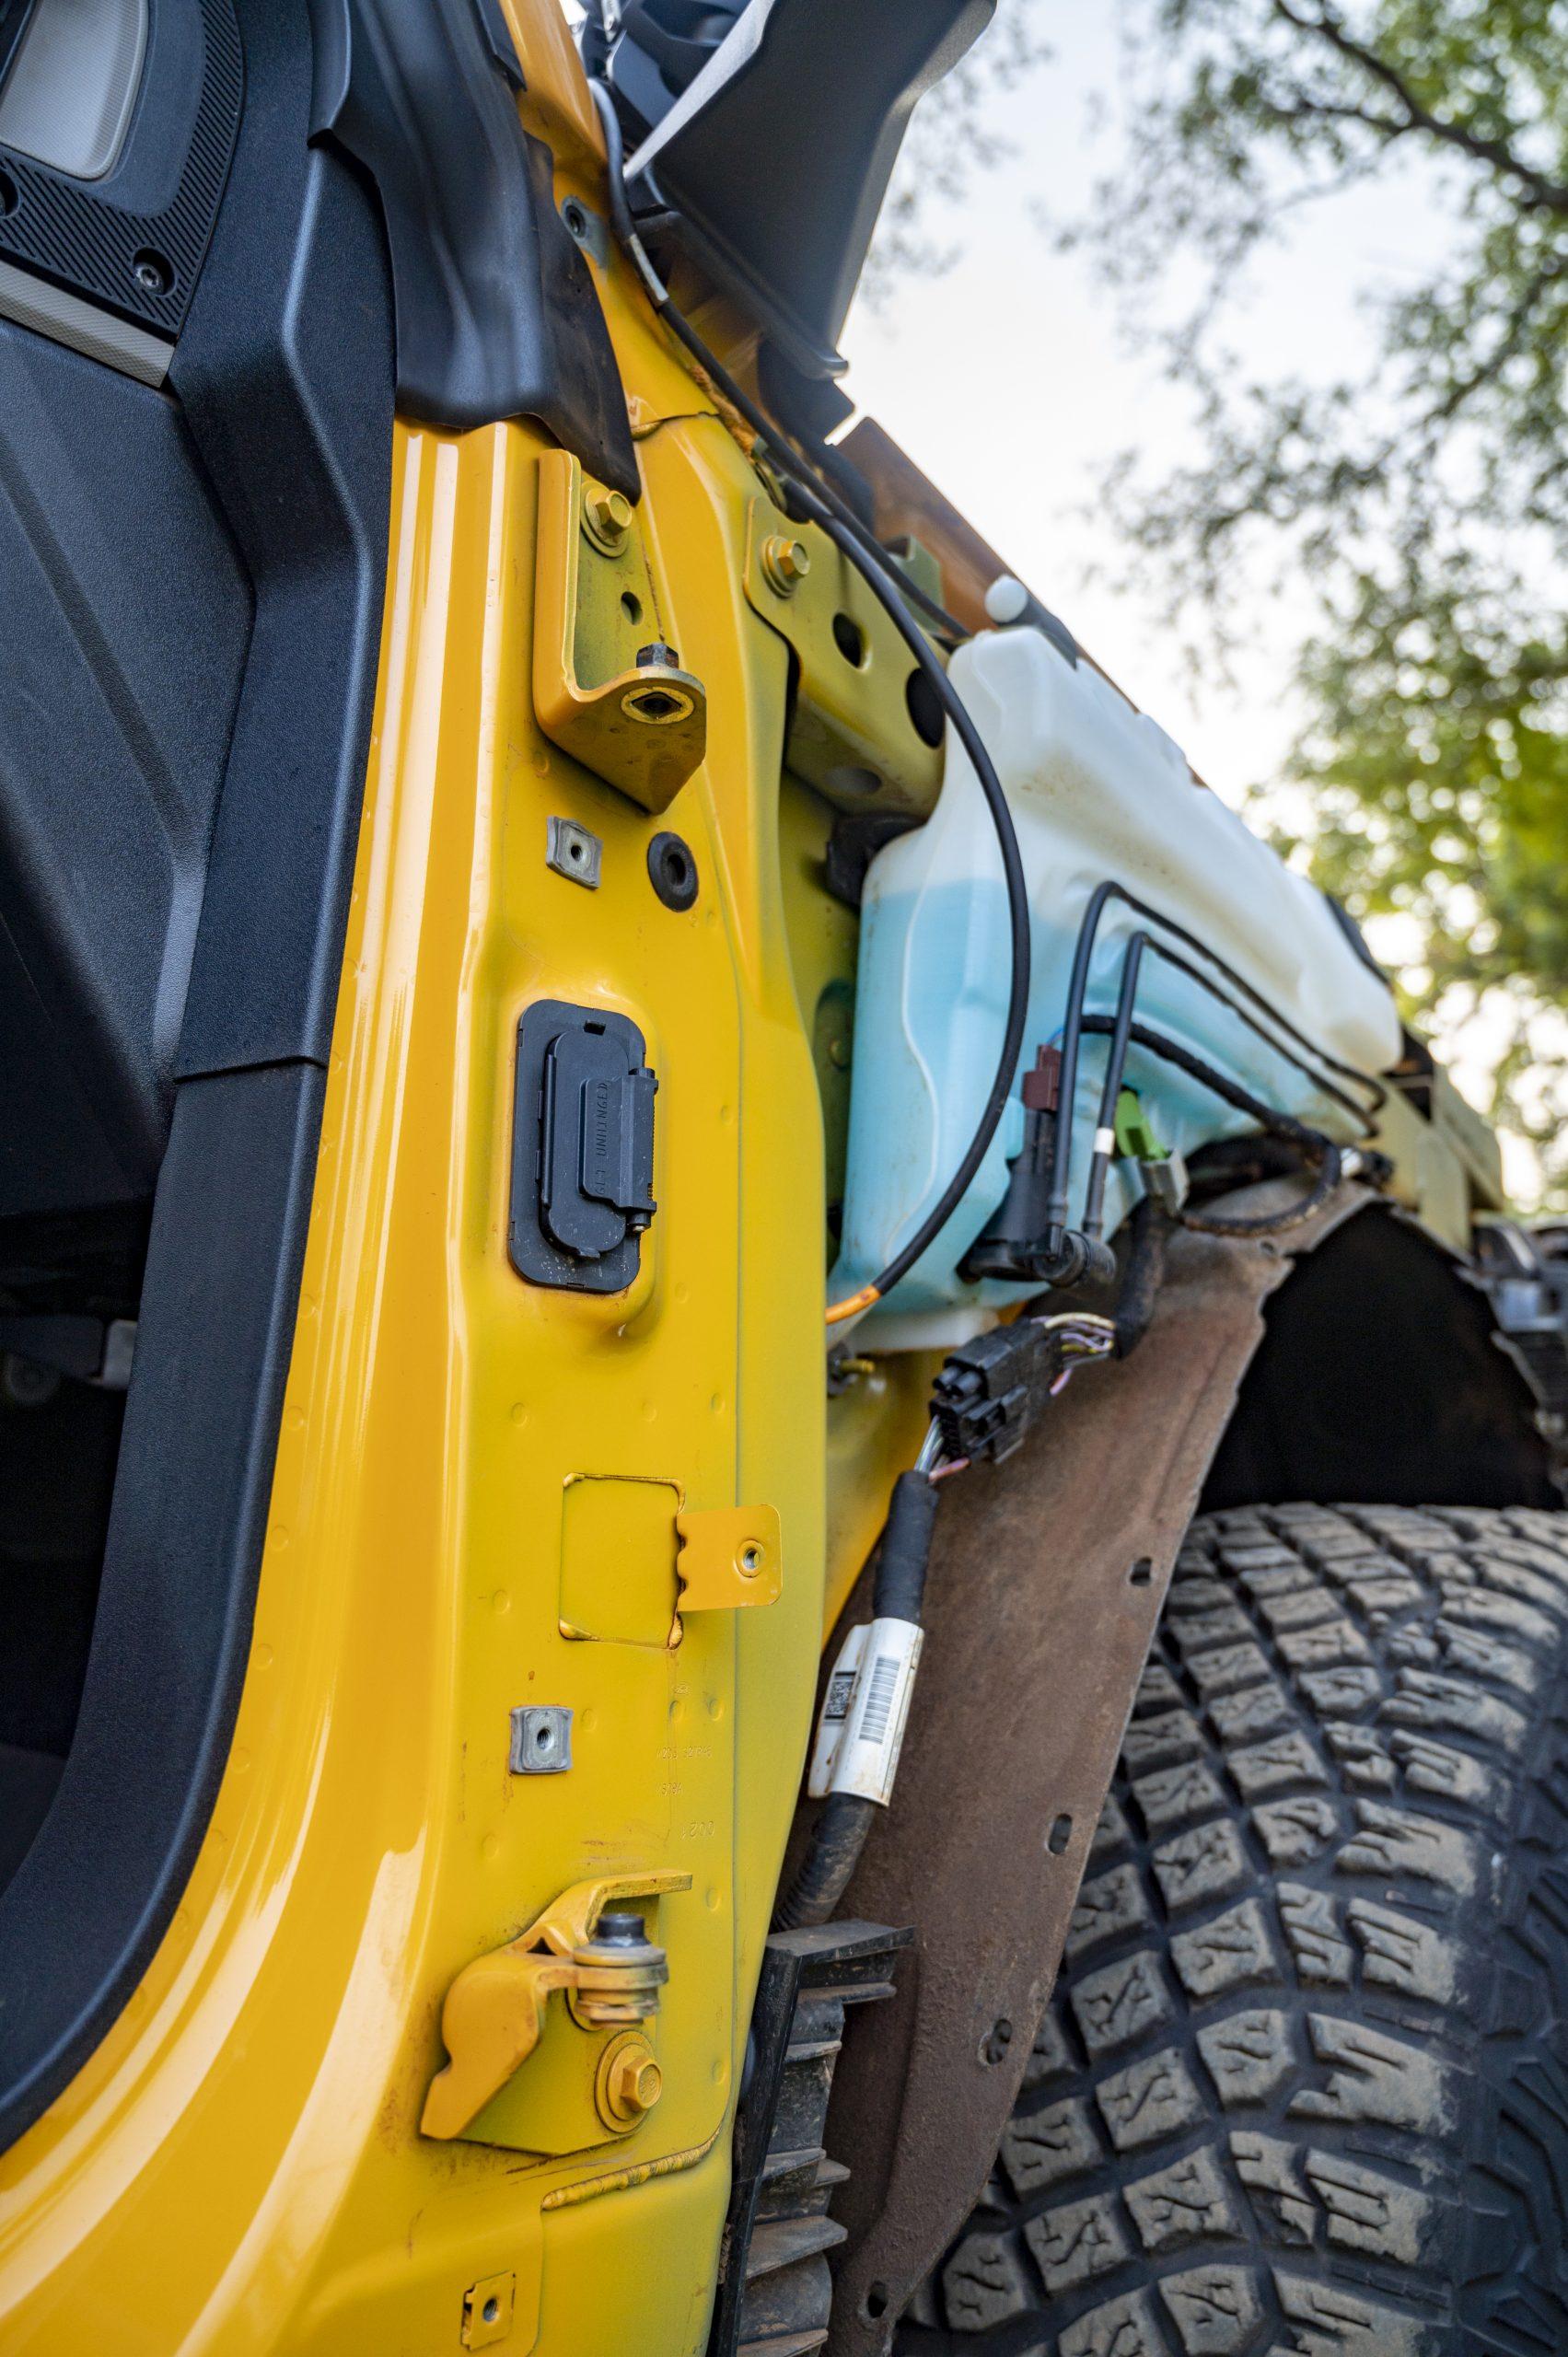 2021 Ford Bronco hinges and fluid reservoir